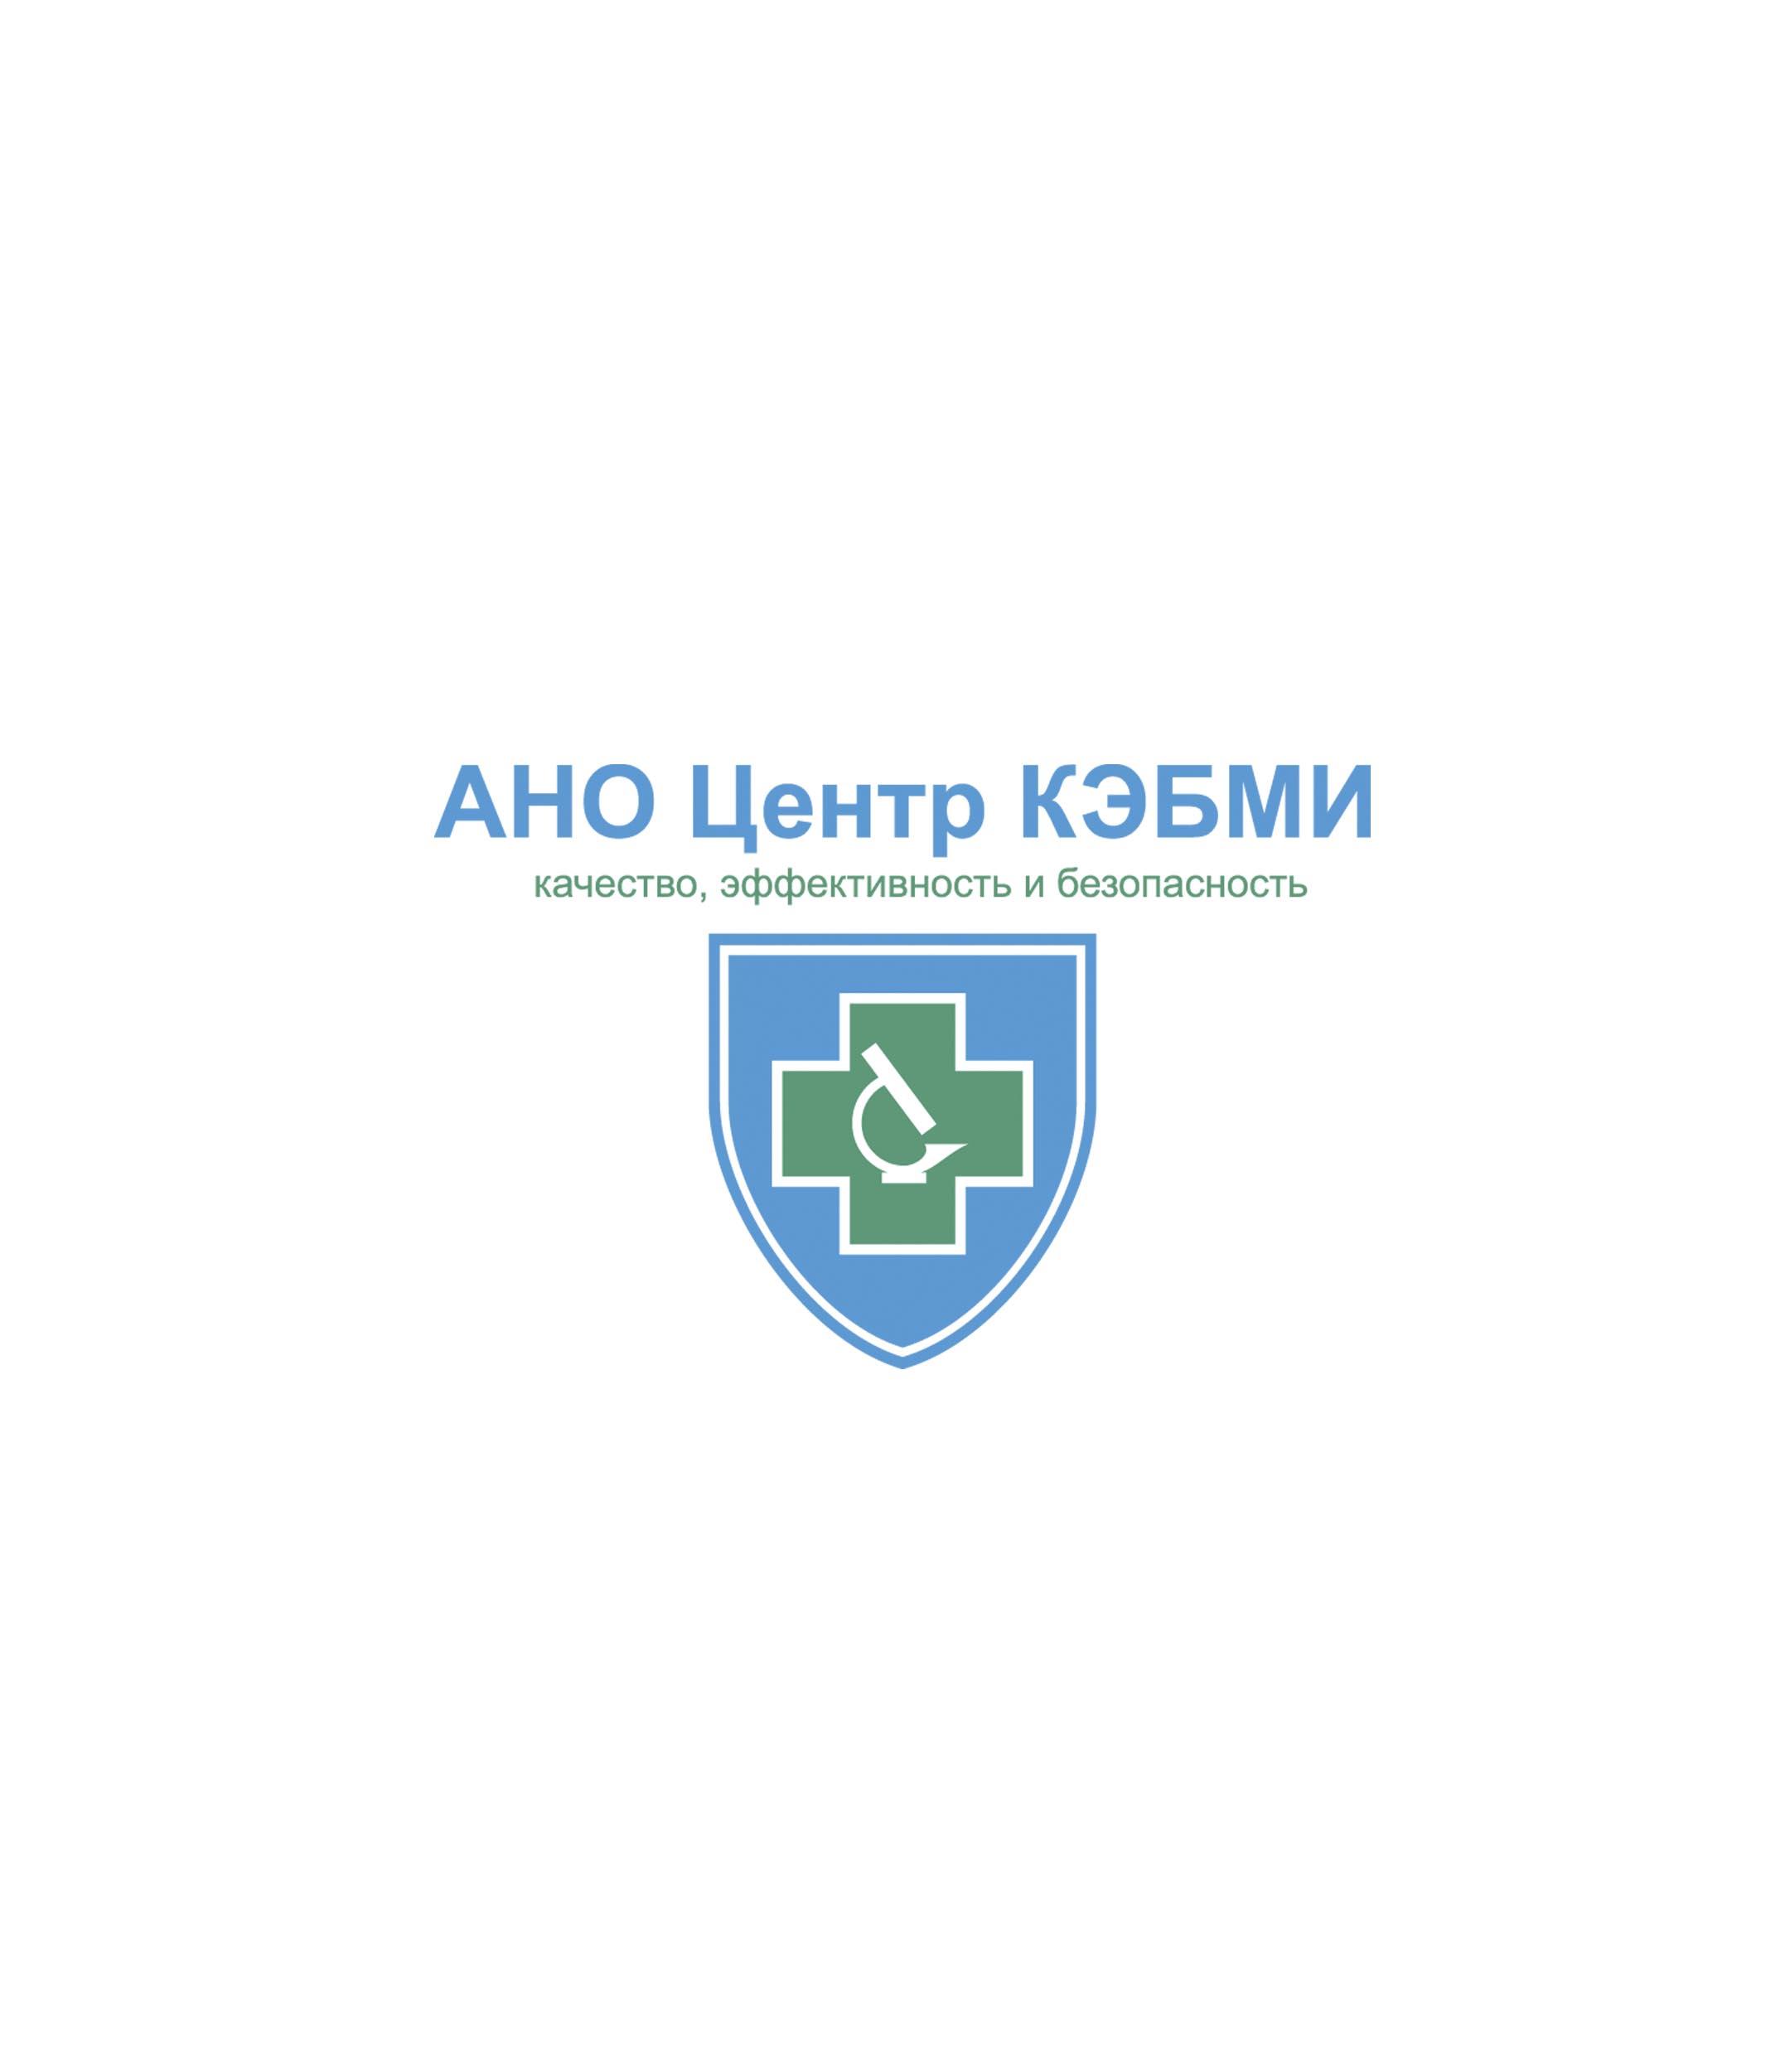 Редизайн логотипа АНО Центр КЭБМИ - BREVIS фото f_3895b1b79244668c.jpg